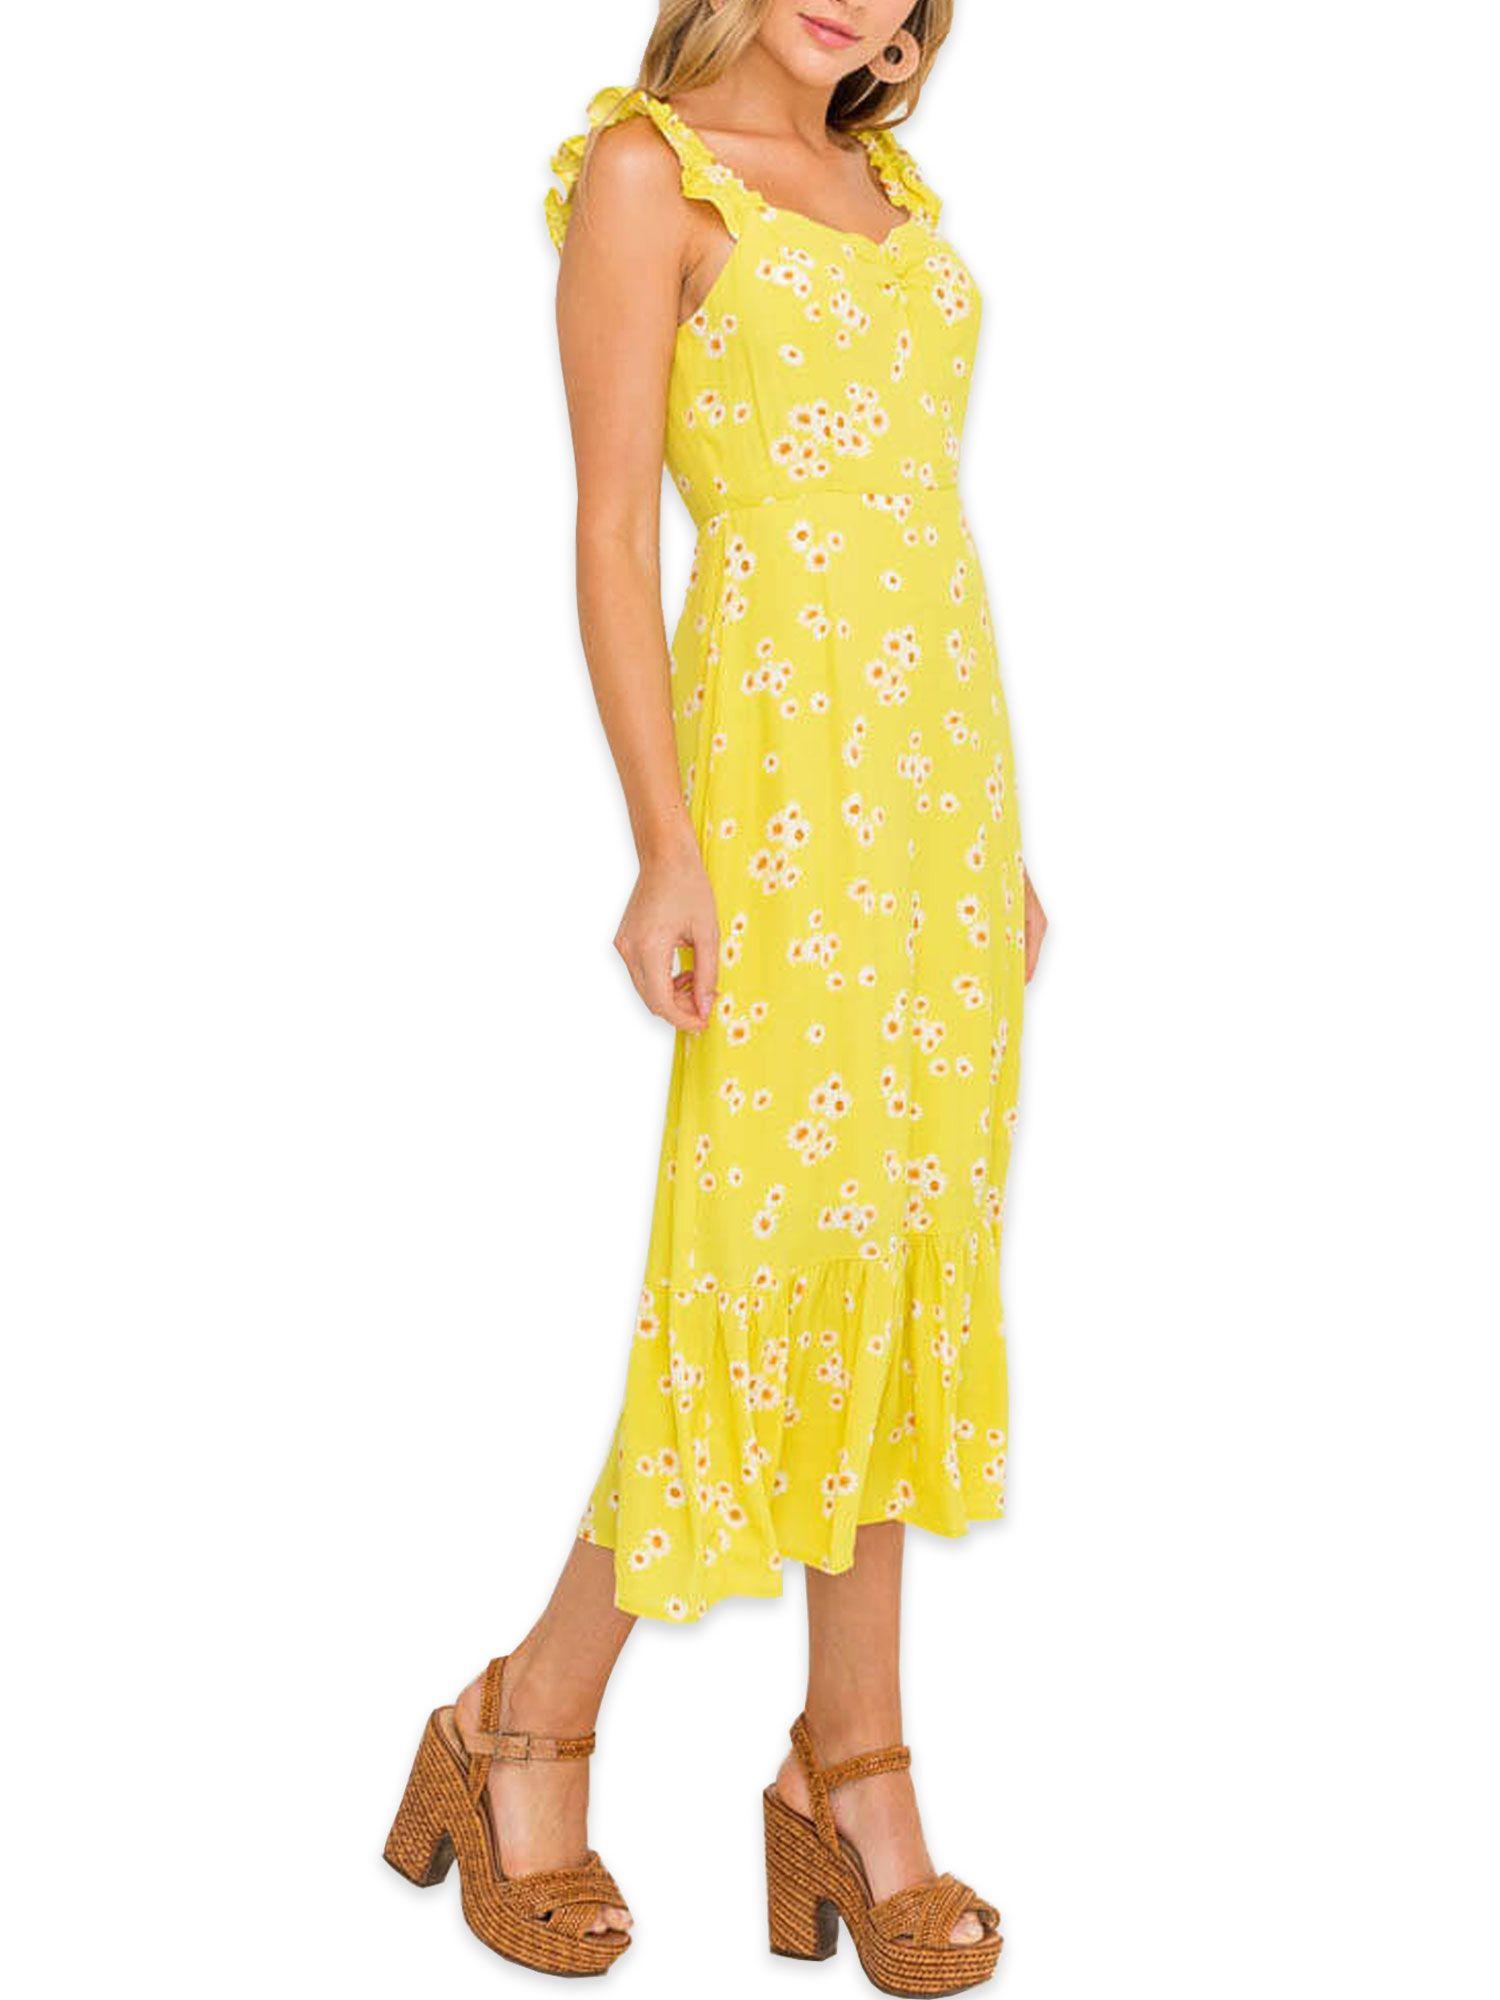 Lush Clothing Lush Clothing Ruffle Strap Midi Dress Walmart Com Lush Clothing Dresses Midi Dress [ 2000 x 1500 Pixel ]